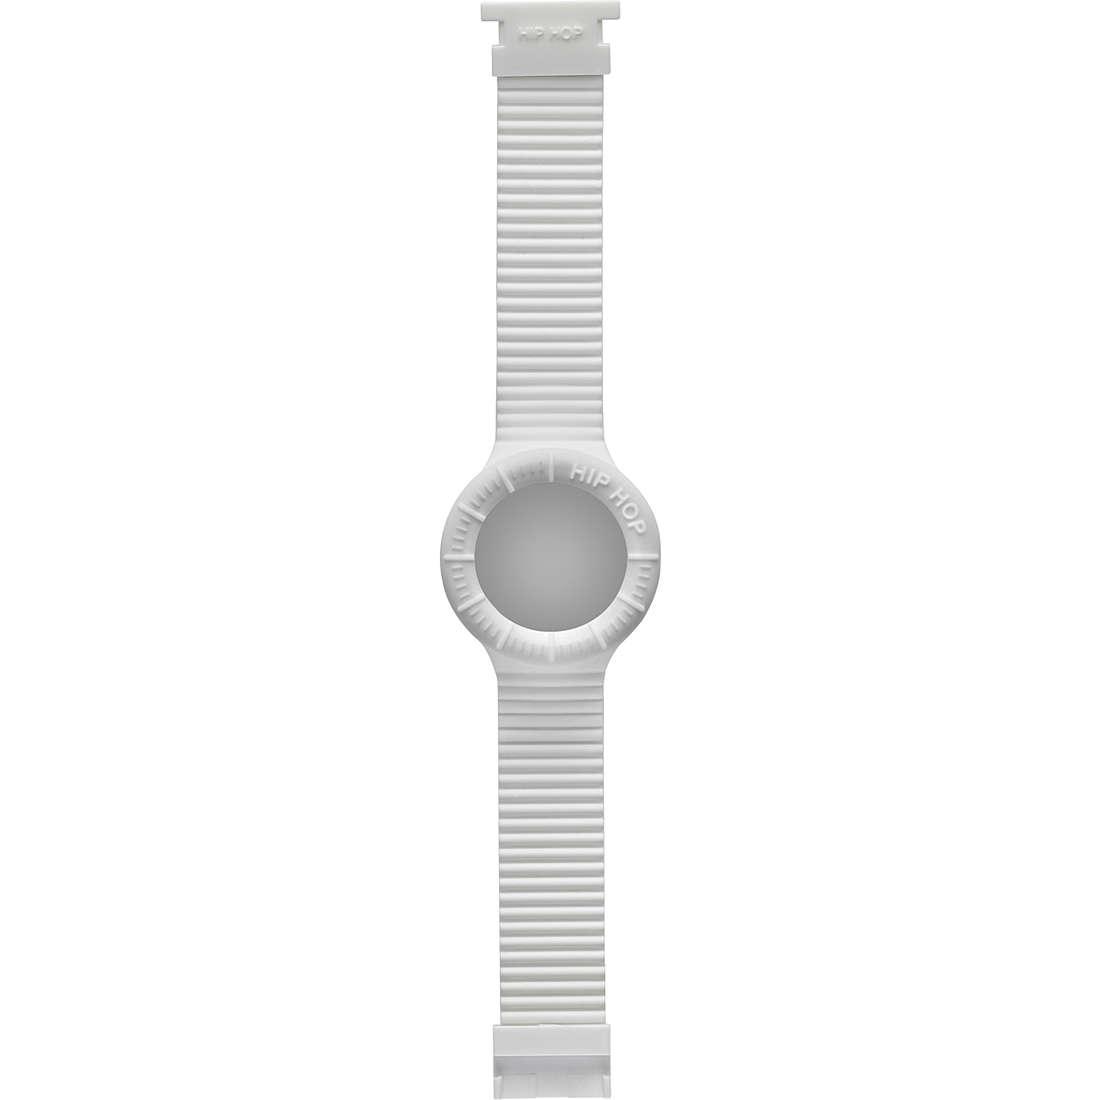 watch watch strap unisex Hip Hop Multifunzione HBU0180